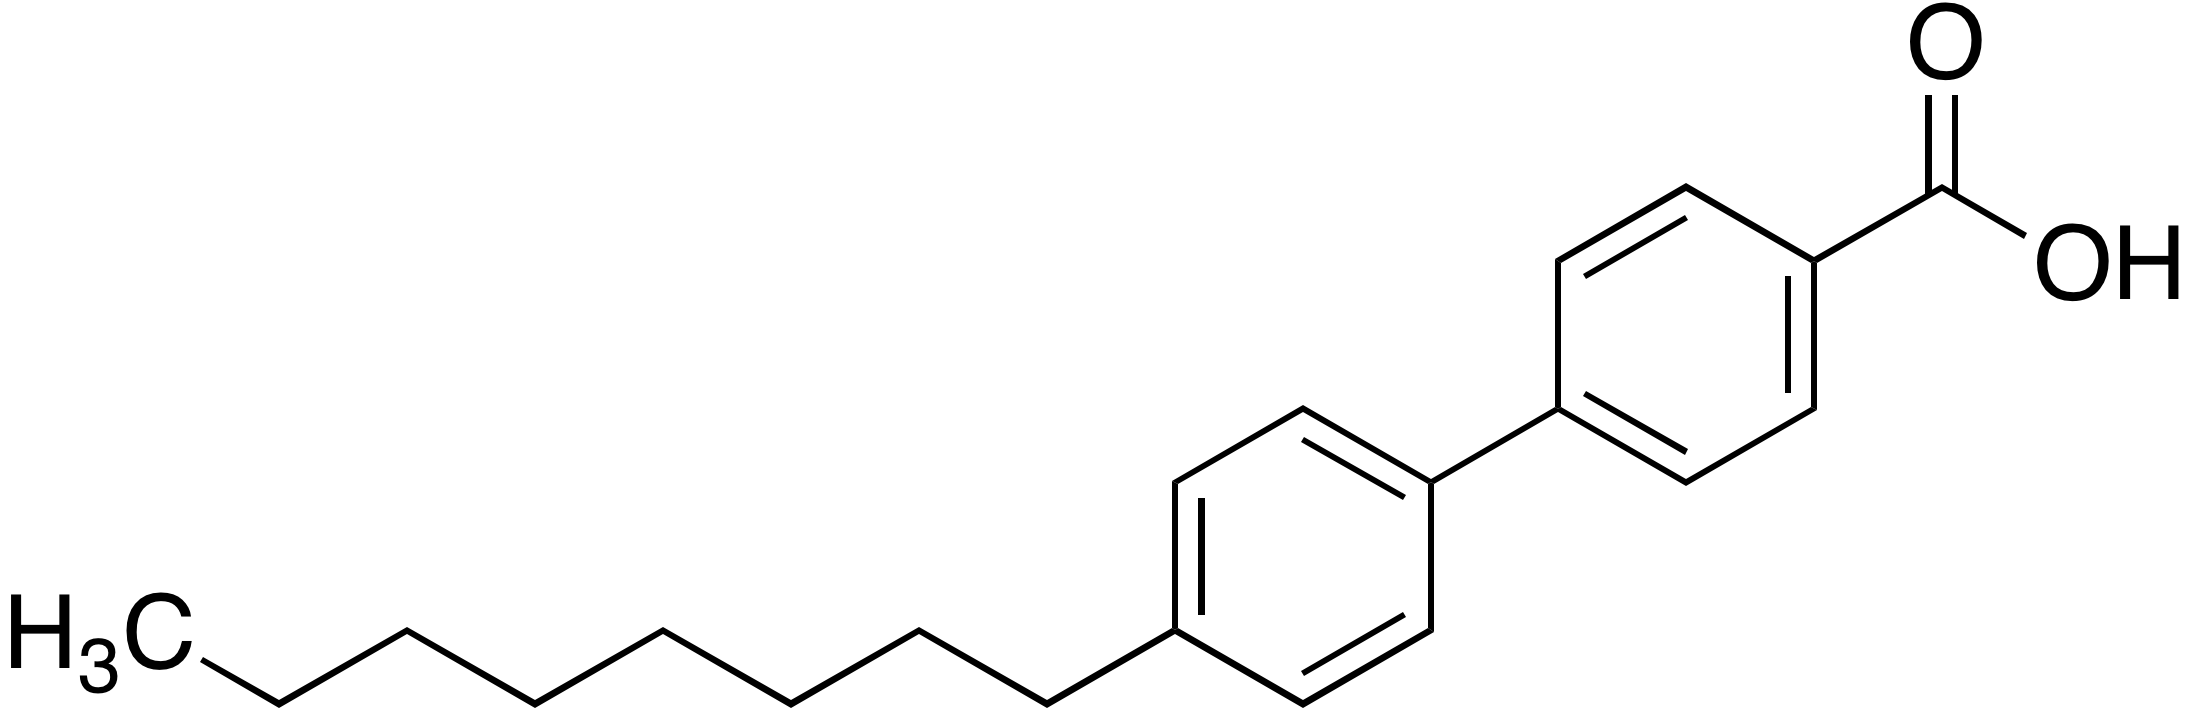 AC 55649